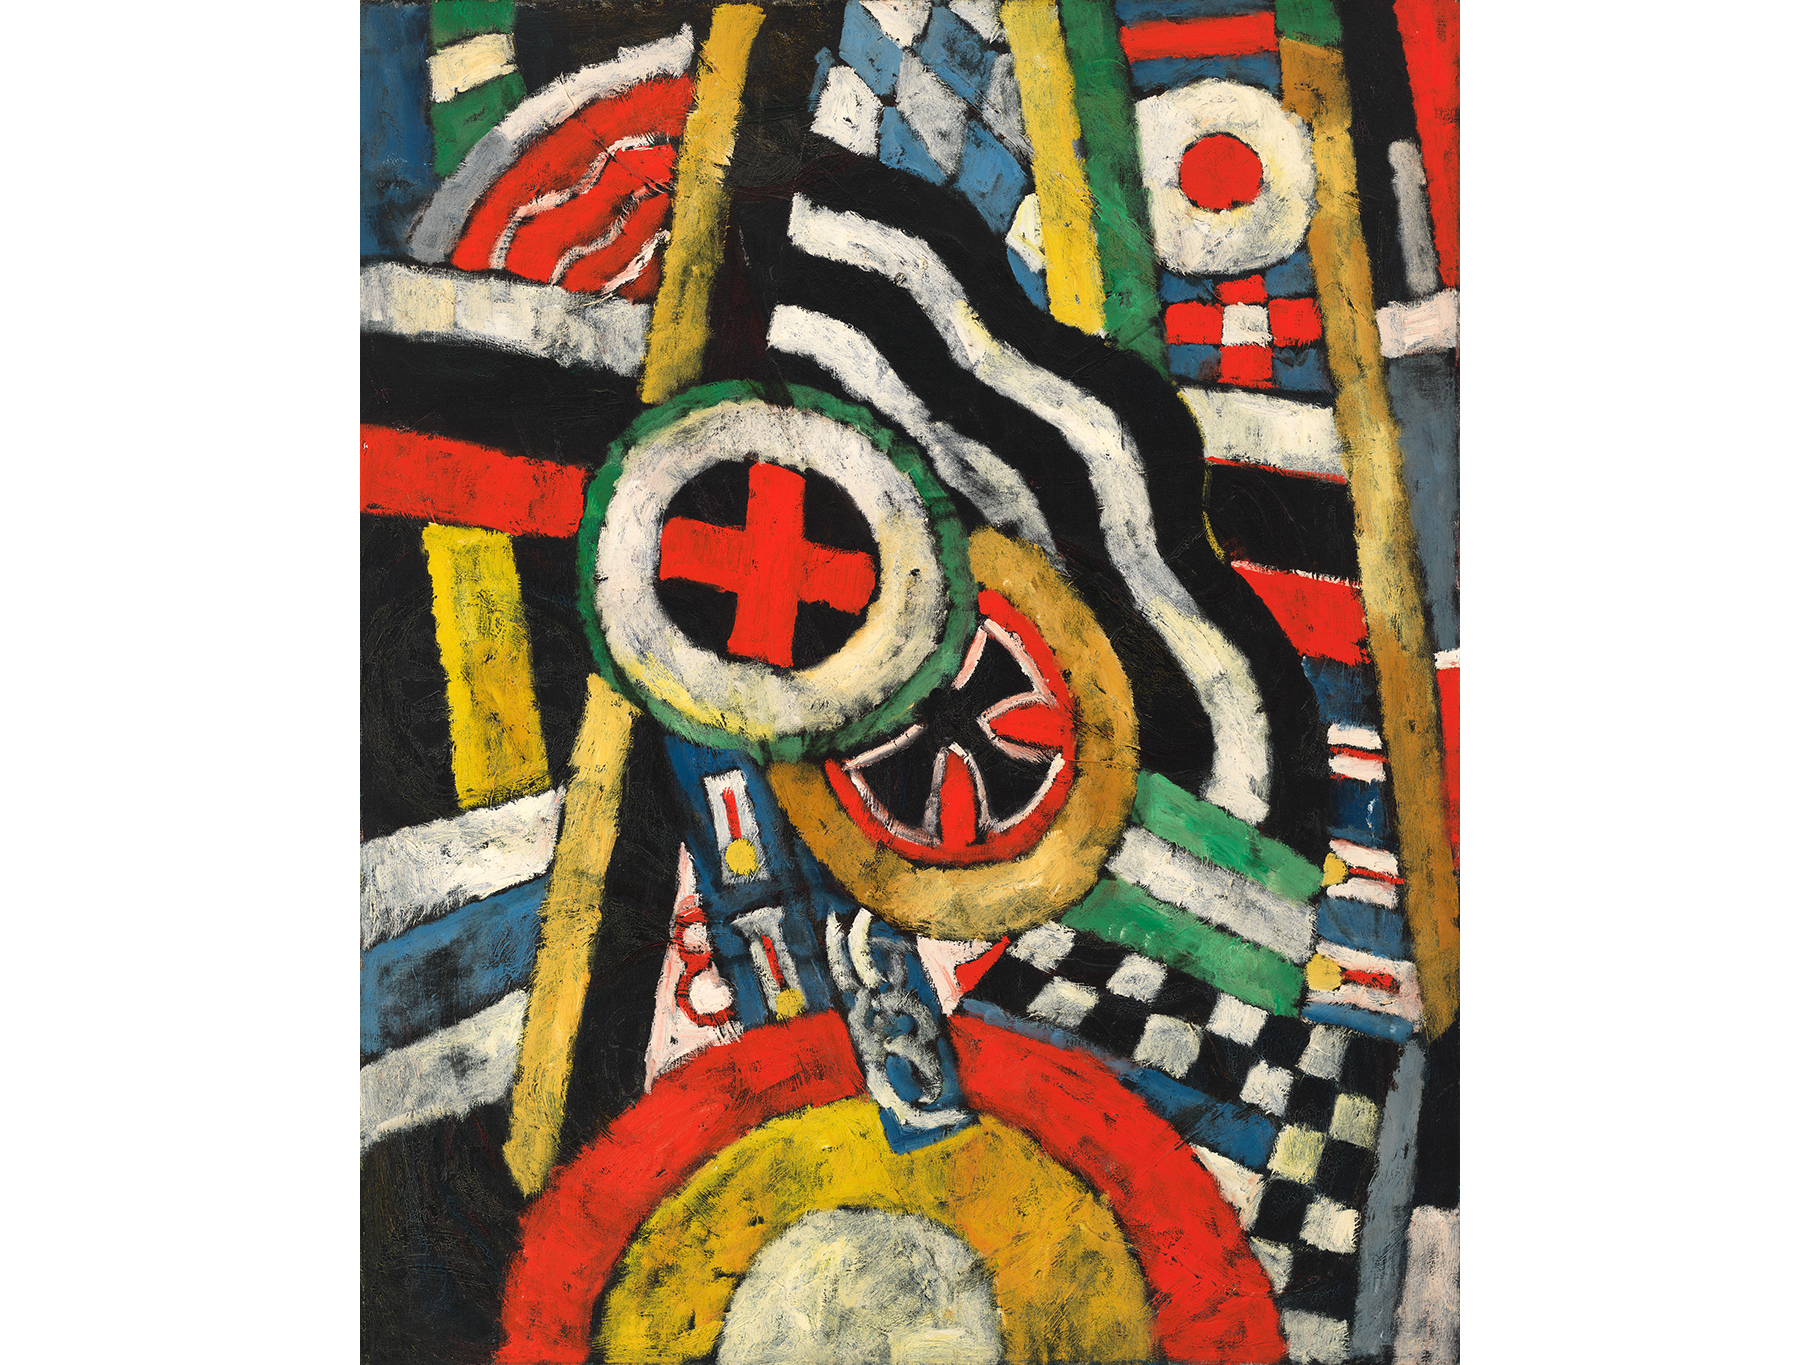 Marsden Hartley, Painting, Number 5, 1914–15